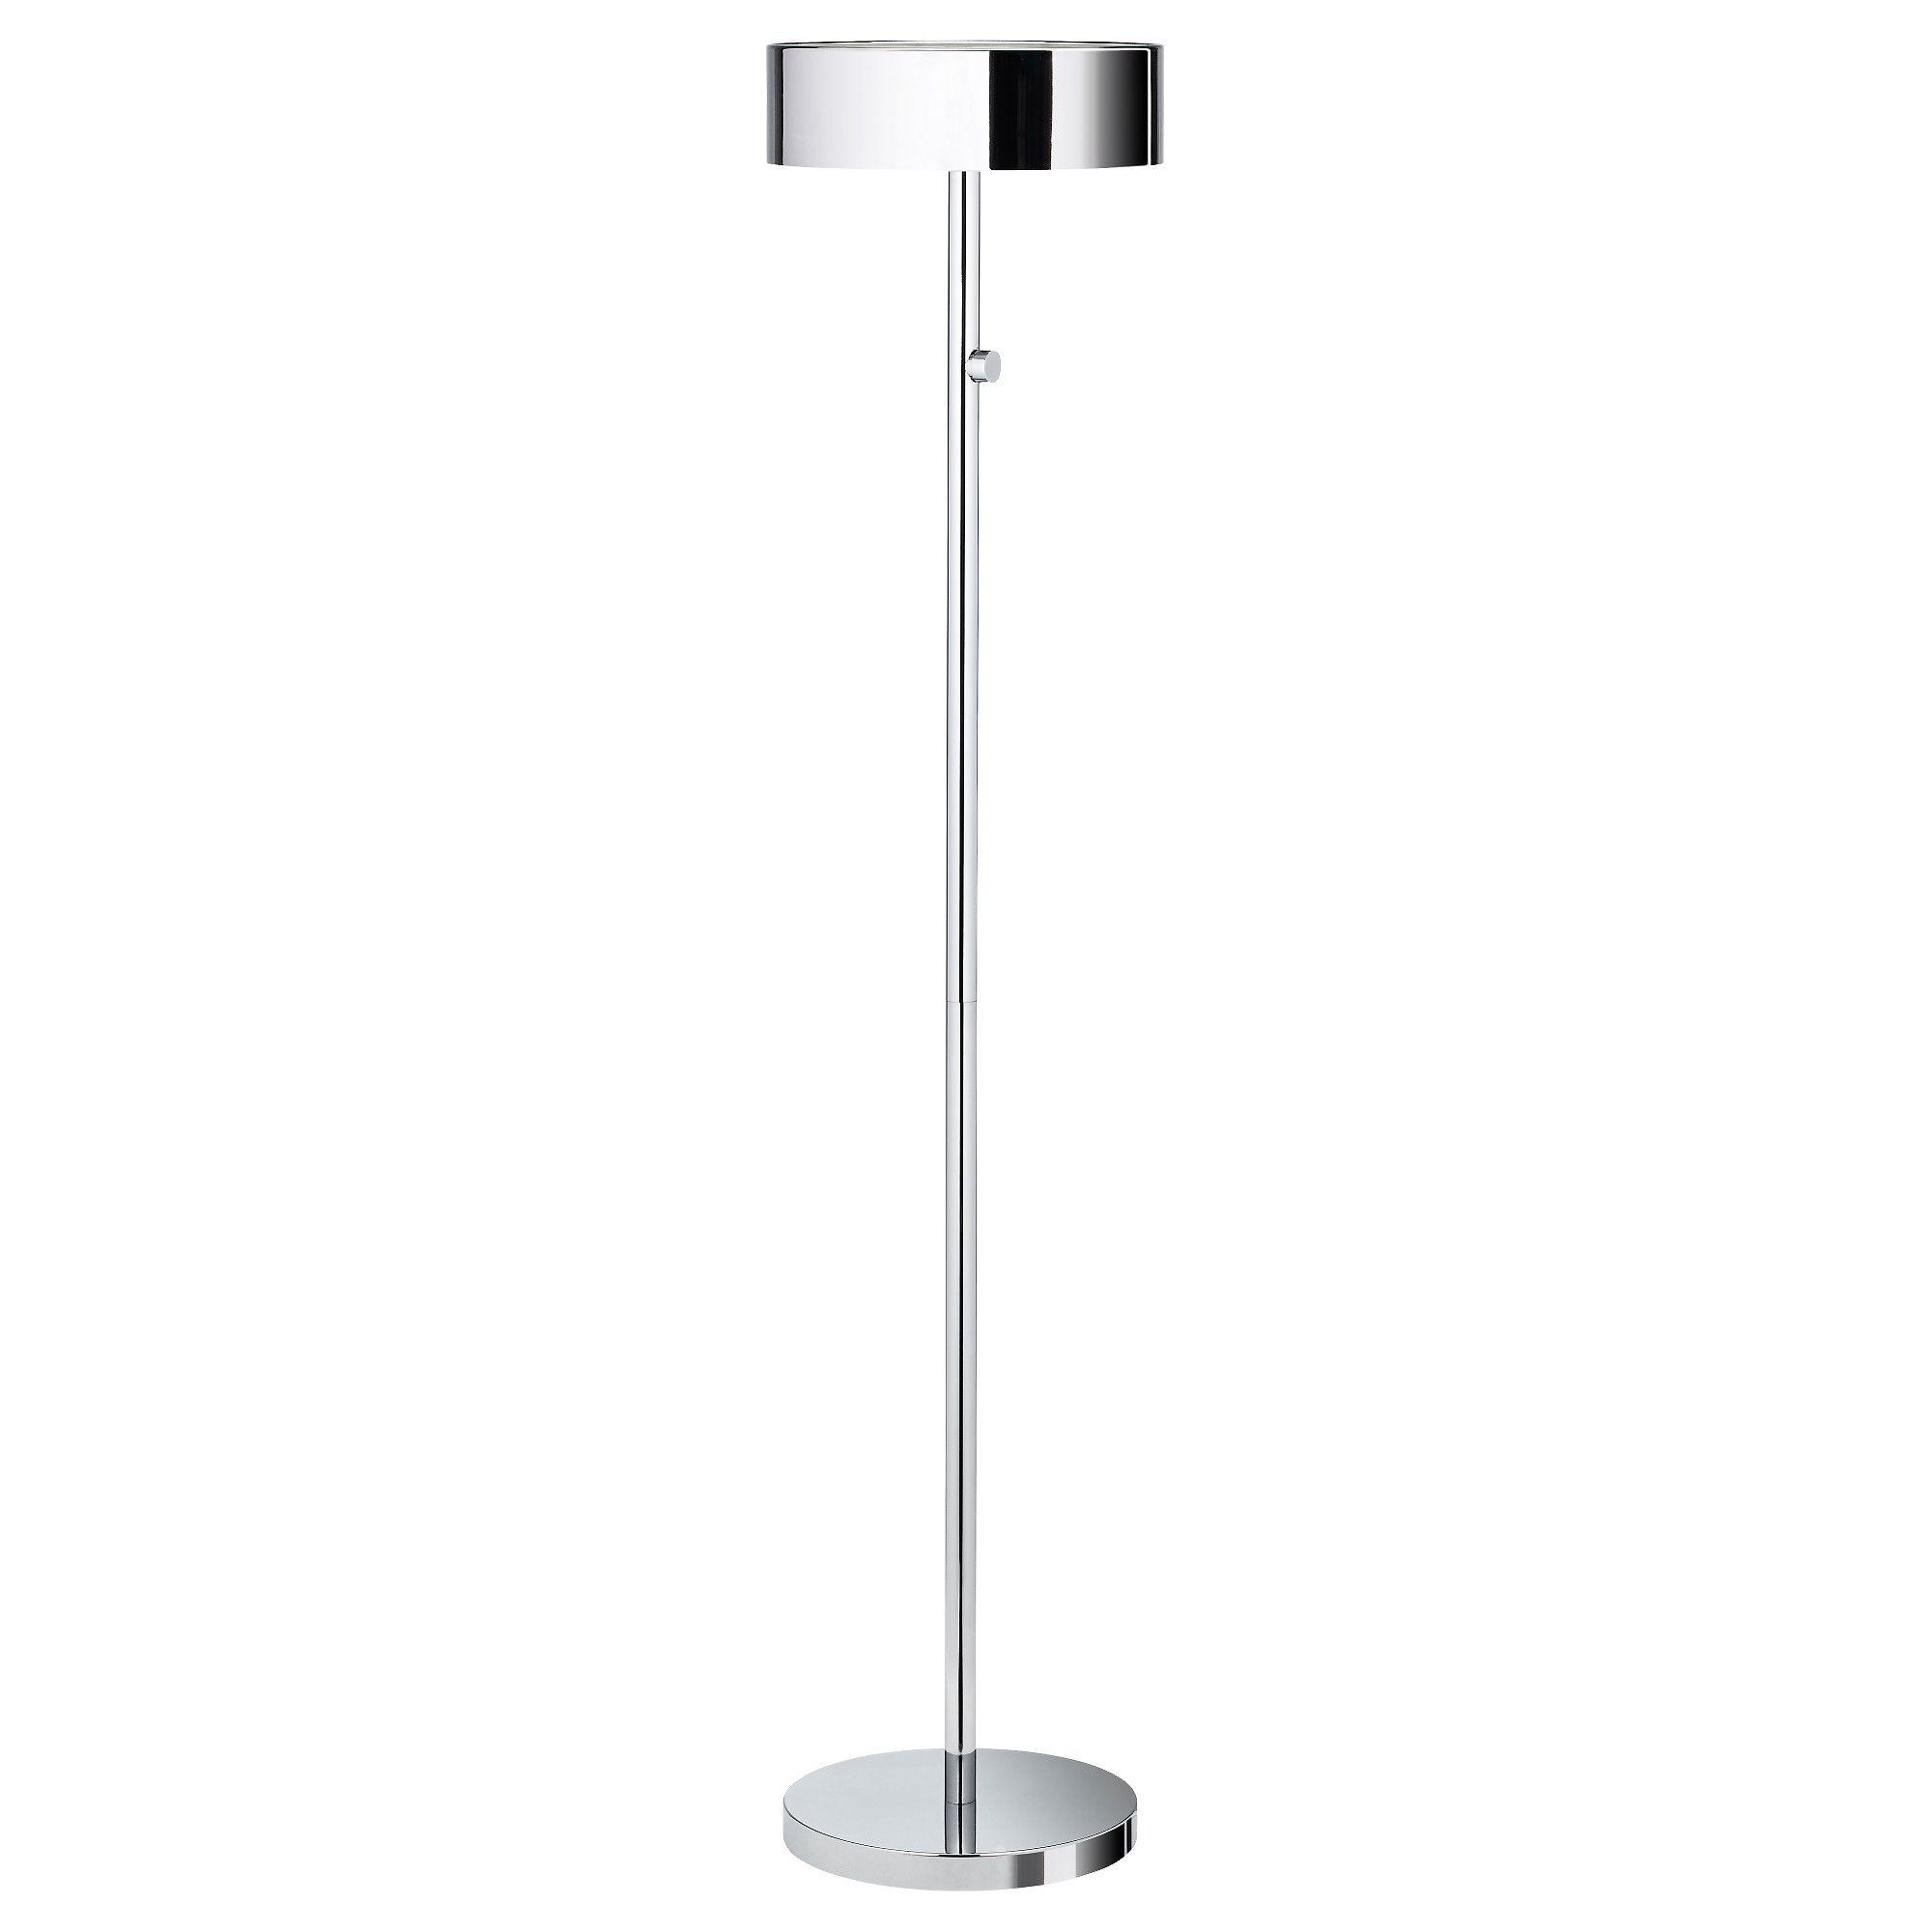 Dimmbare Tischleuchte Bodenlampe Stehlampe Lampen